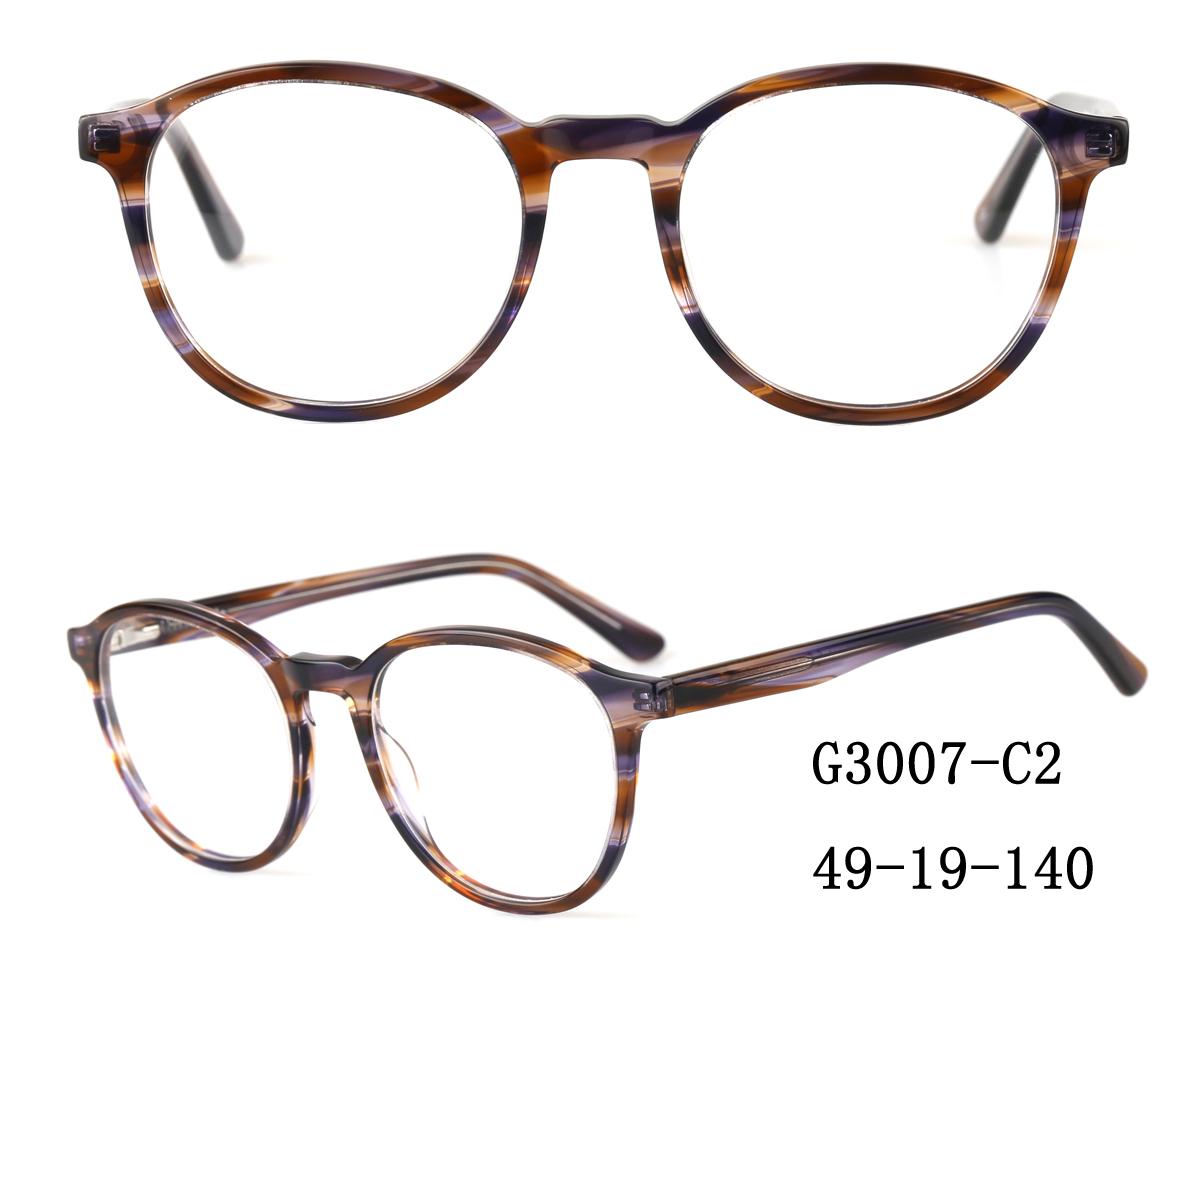 Popeyewear ODM/OEM Transparent Optical Frames Bulk Sell